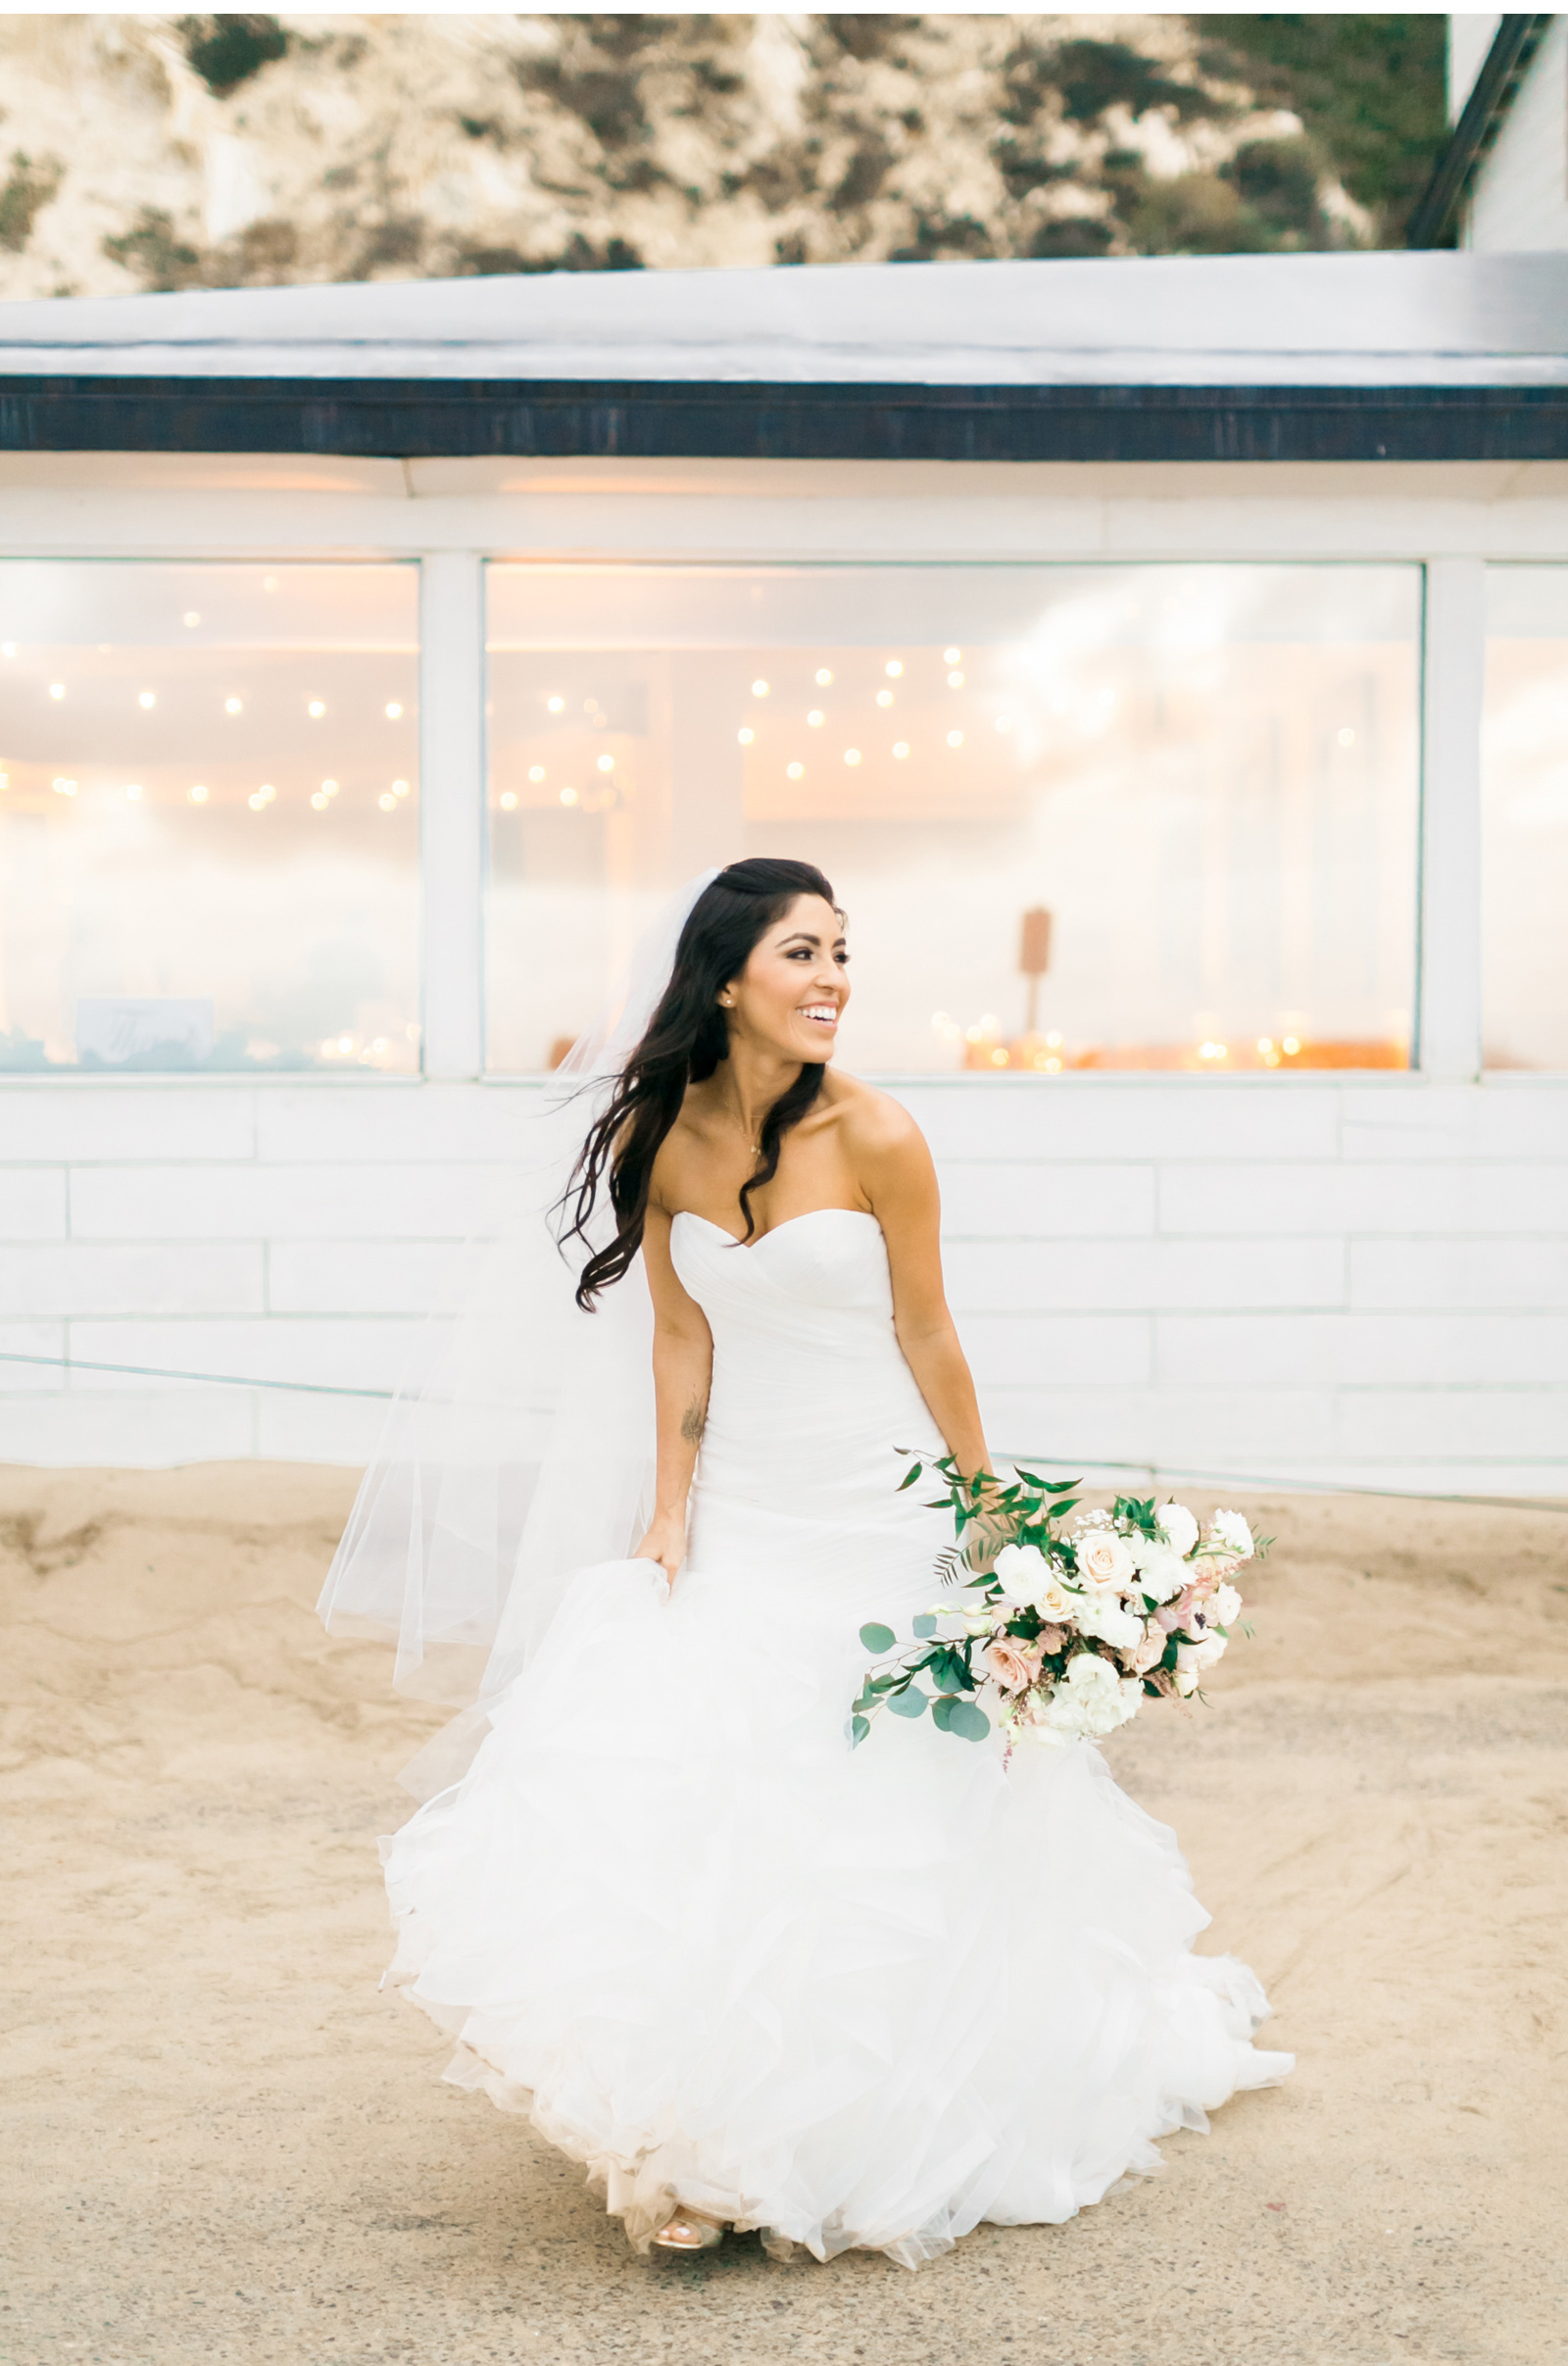 Style-Me-Pretty-Malibu-Beach-CA-Wedding-Natalie-Schutt-Photography_12.jpg